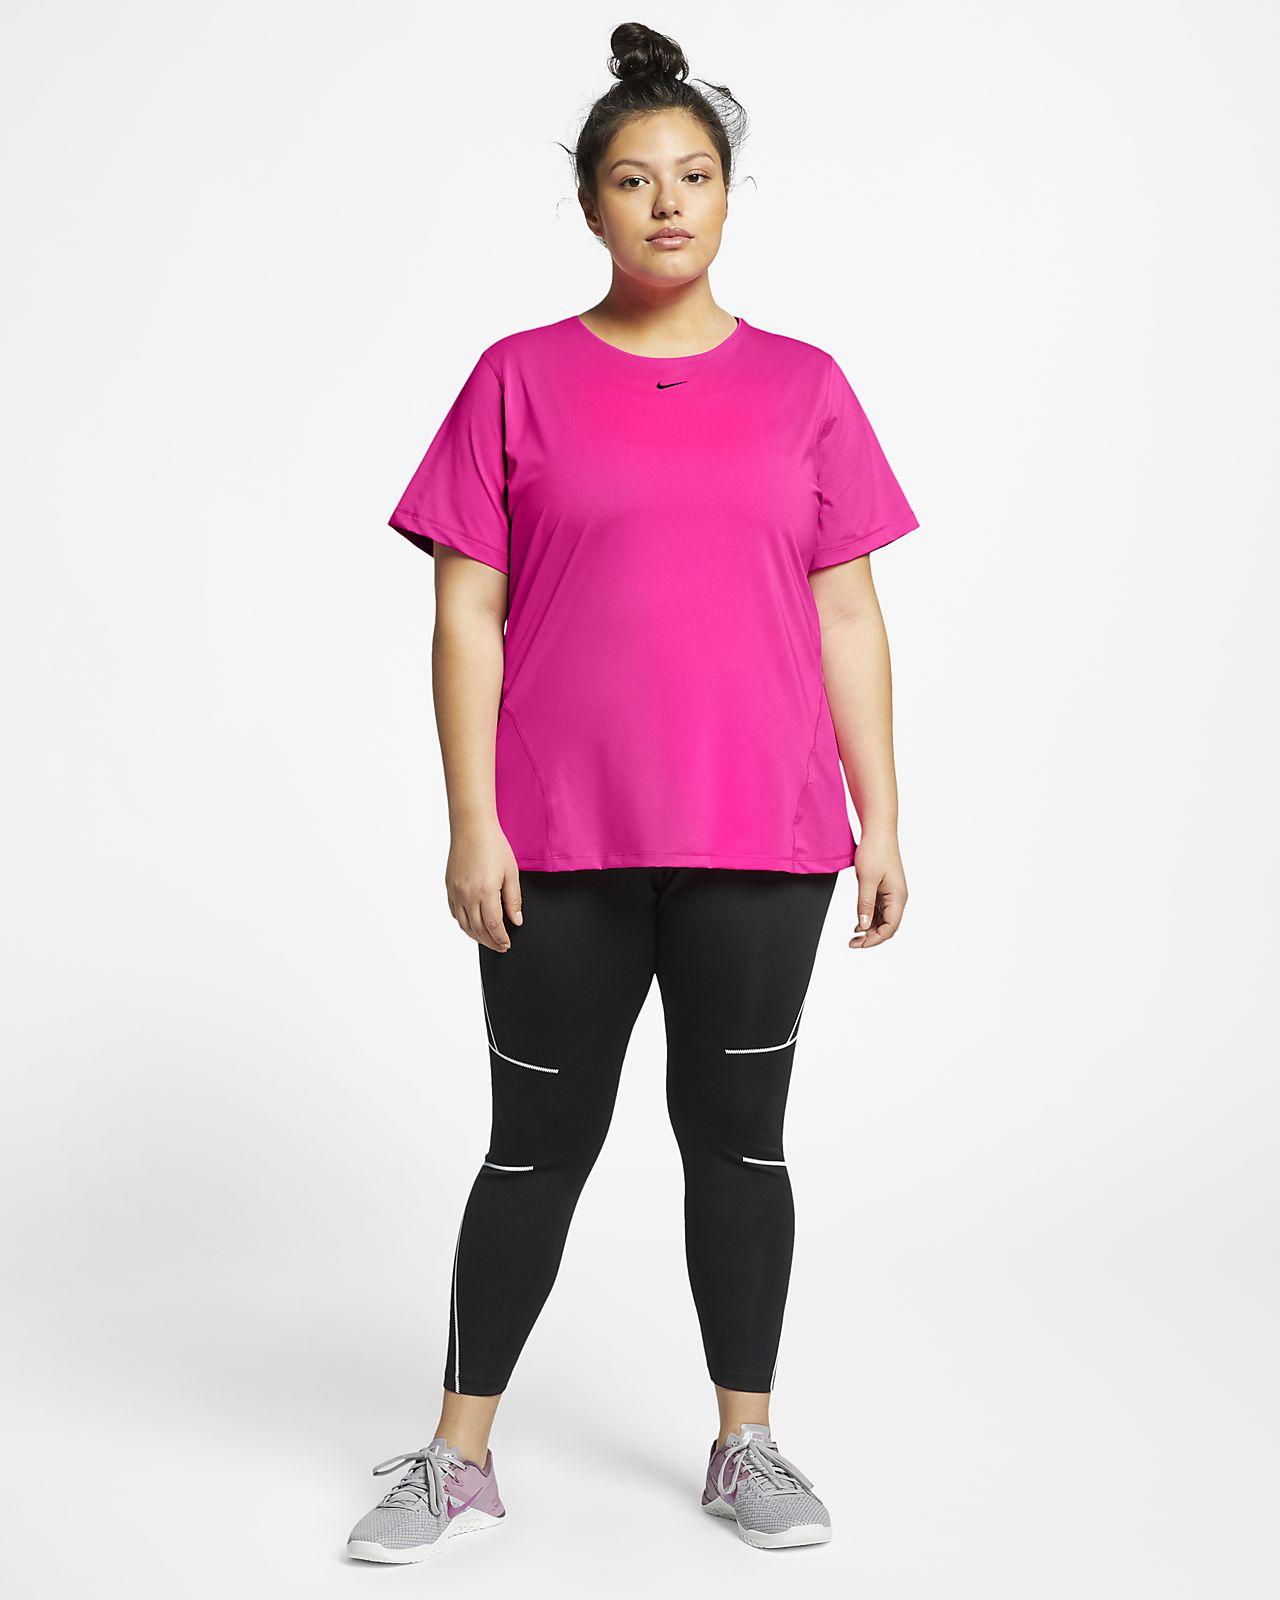 cf0897840c6e5a Nike Pro Women s Mesh Top (Plus Size). Nike.com SA